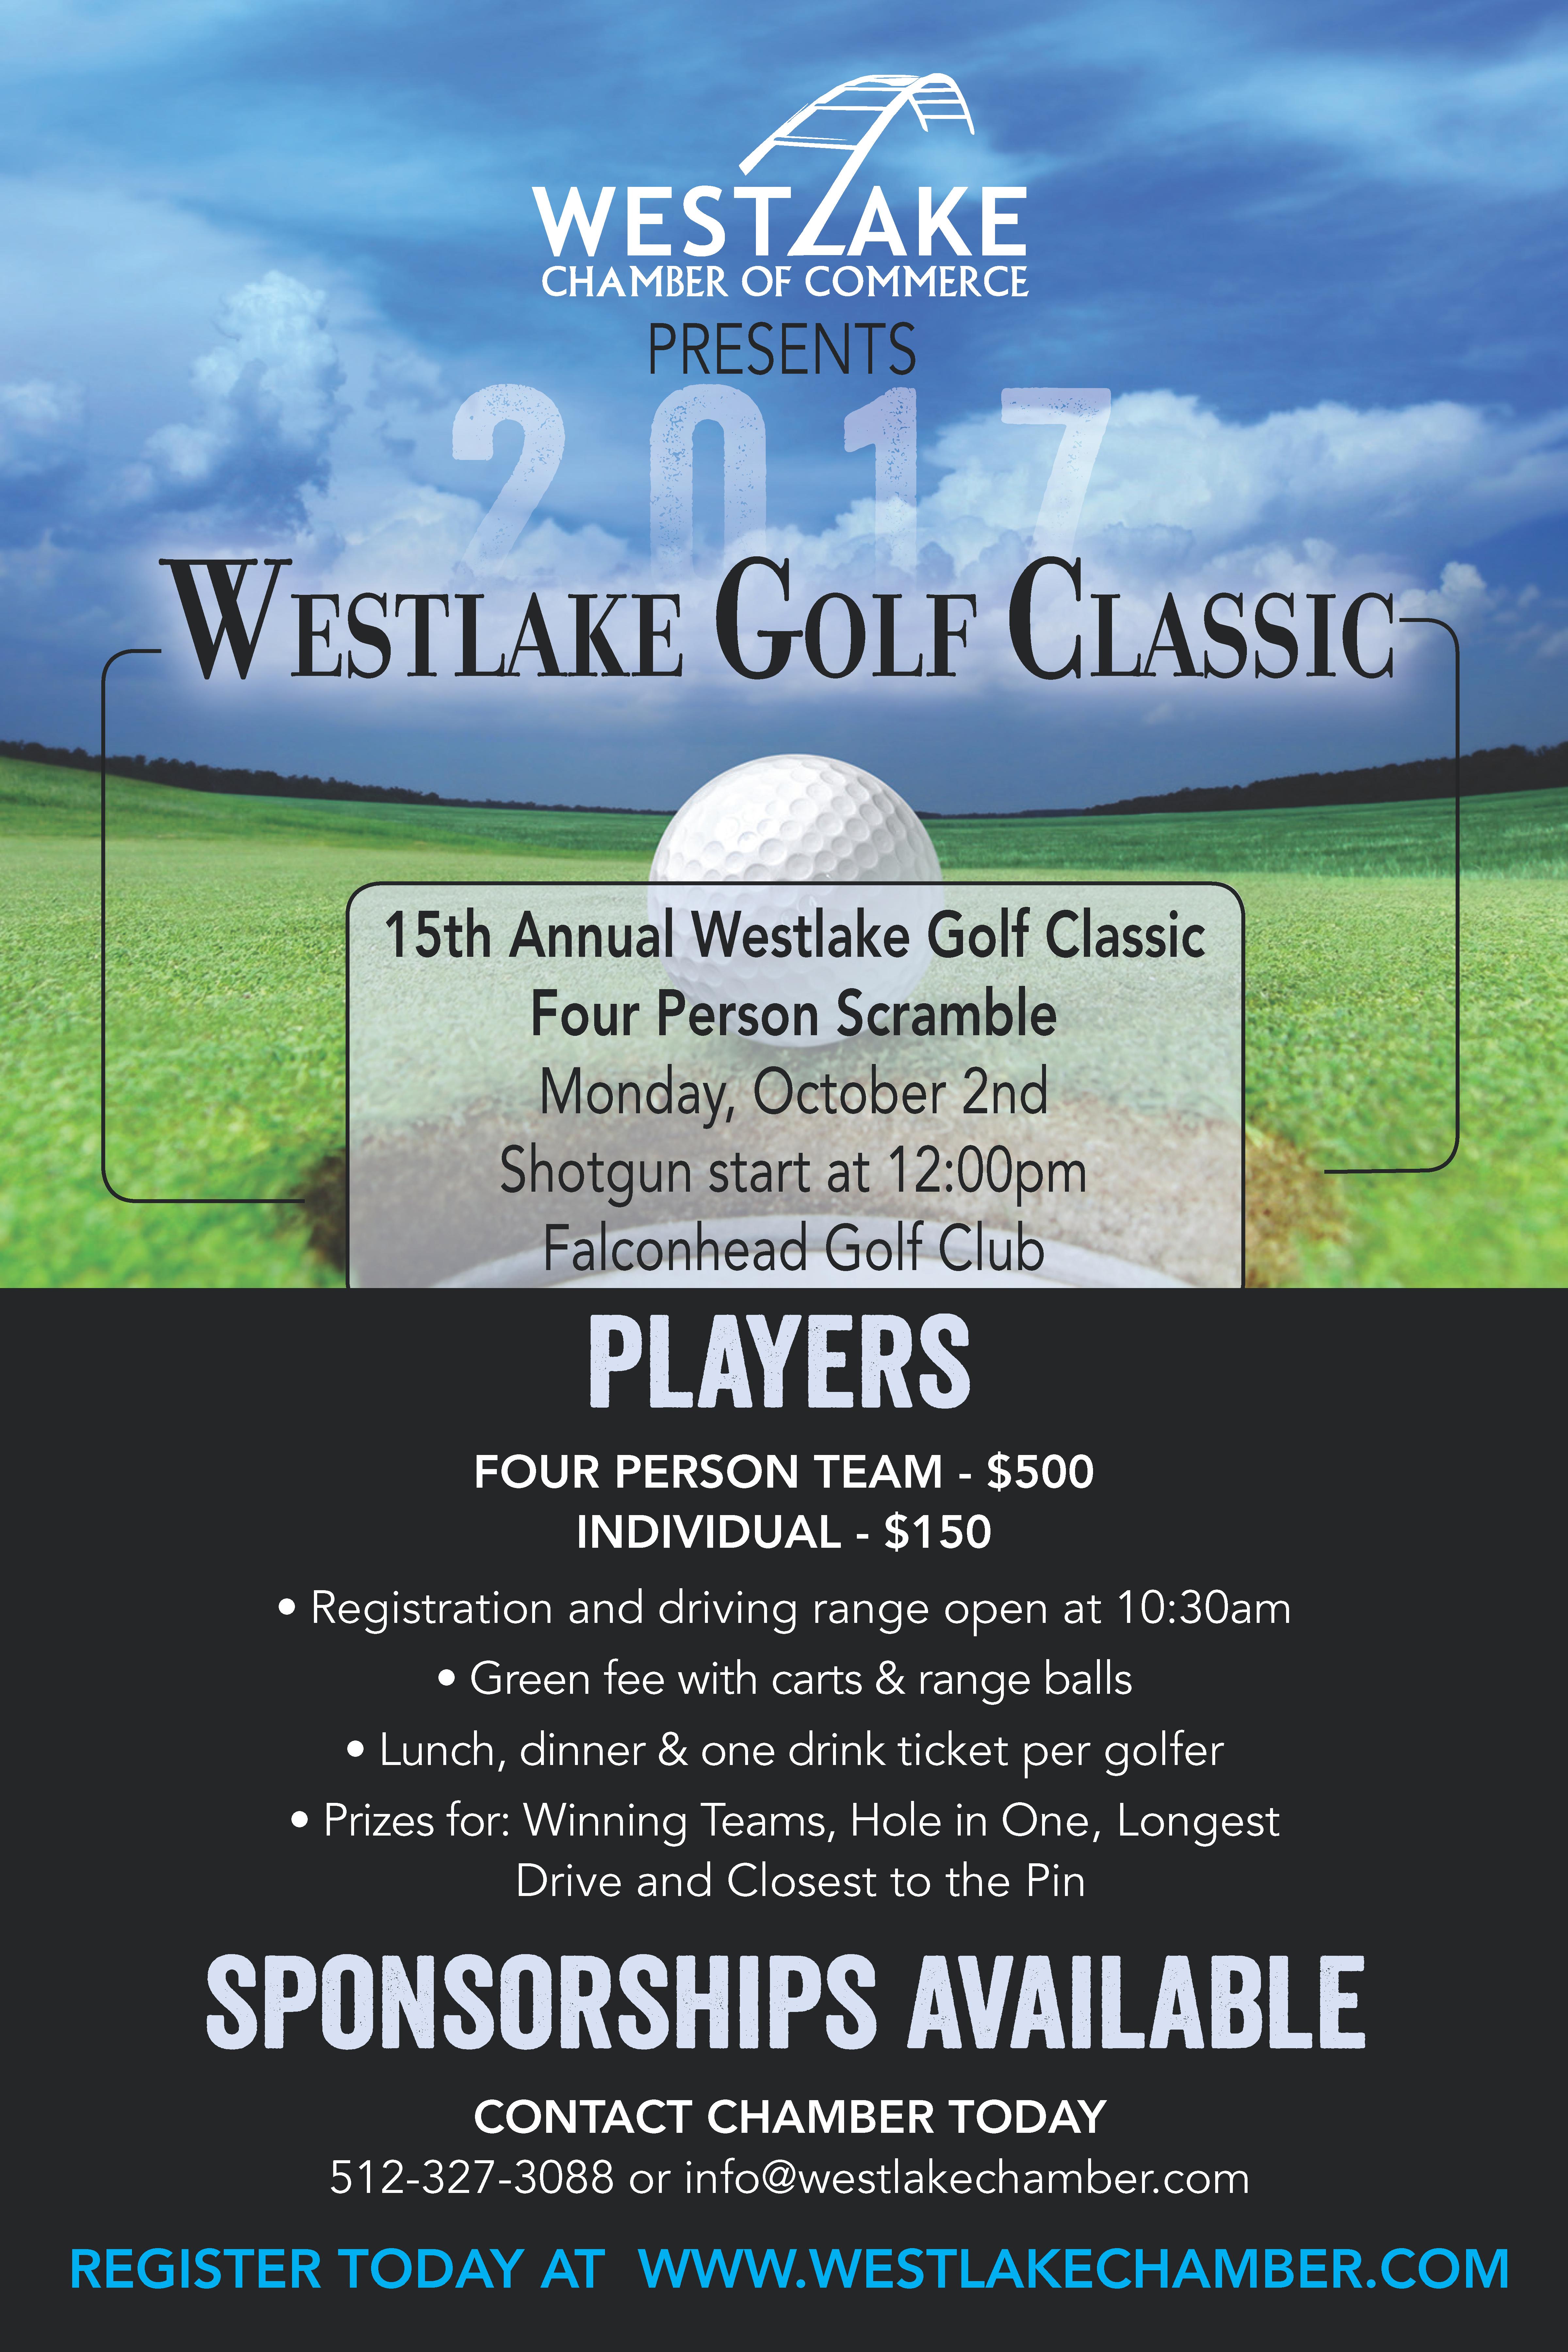 2017 Westlake Golf Classic